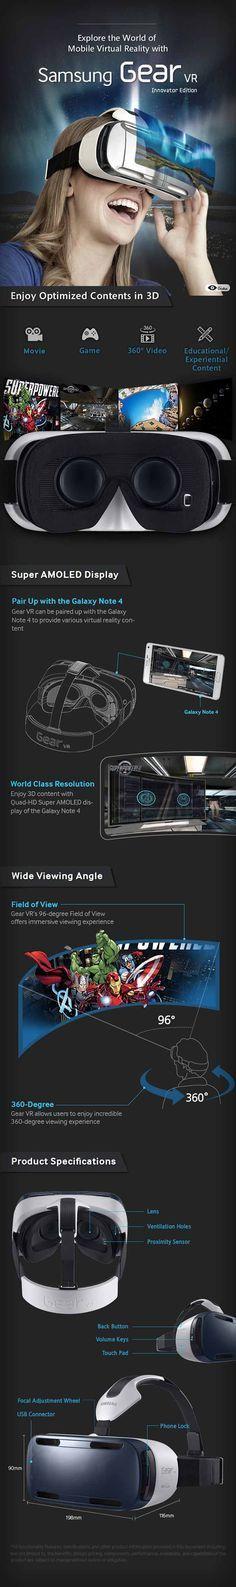 Samsung Galaxy Gear VR (Explore the world of mobile virtual reality) [Virtual Reality: http://futuristicnews.com/tag/virtual-reality/ VR Headsets: http://futuristicshop.com/category/video-glasses-2/]